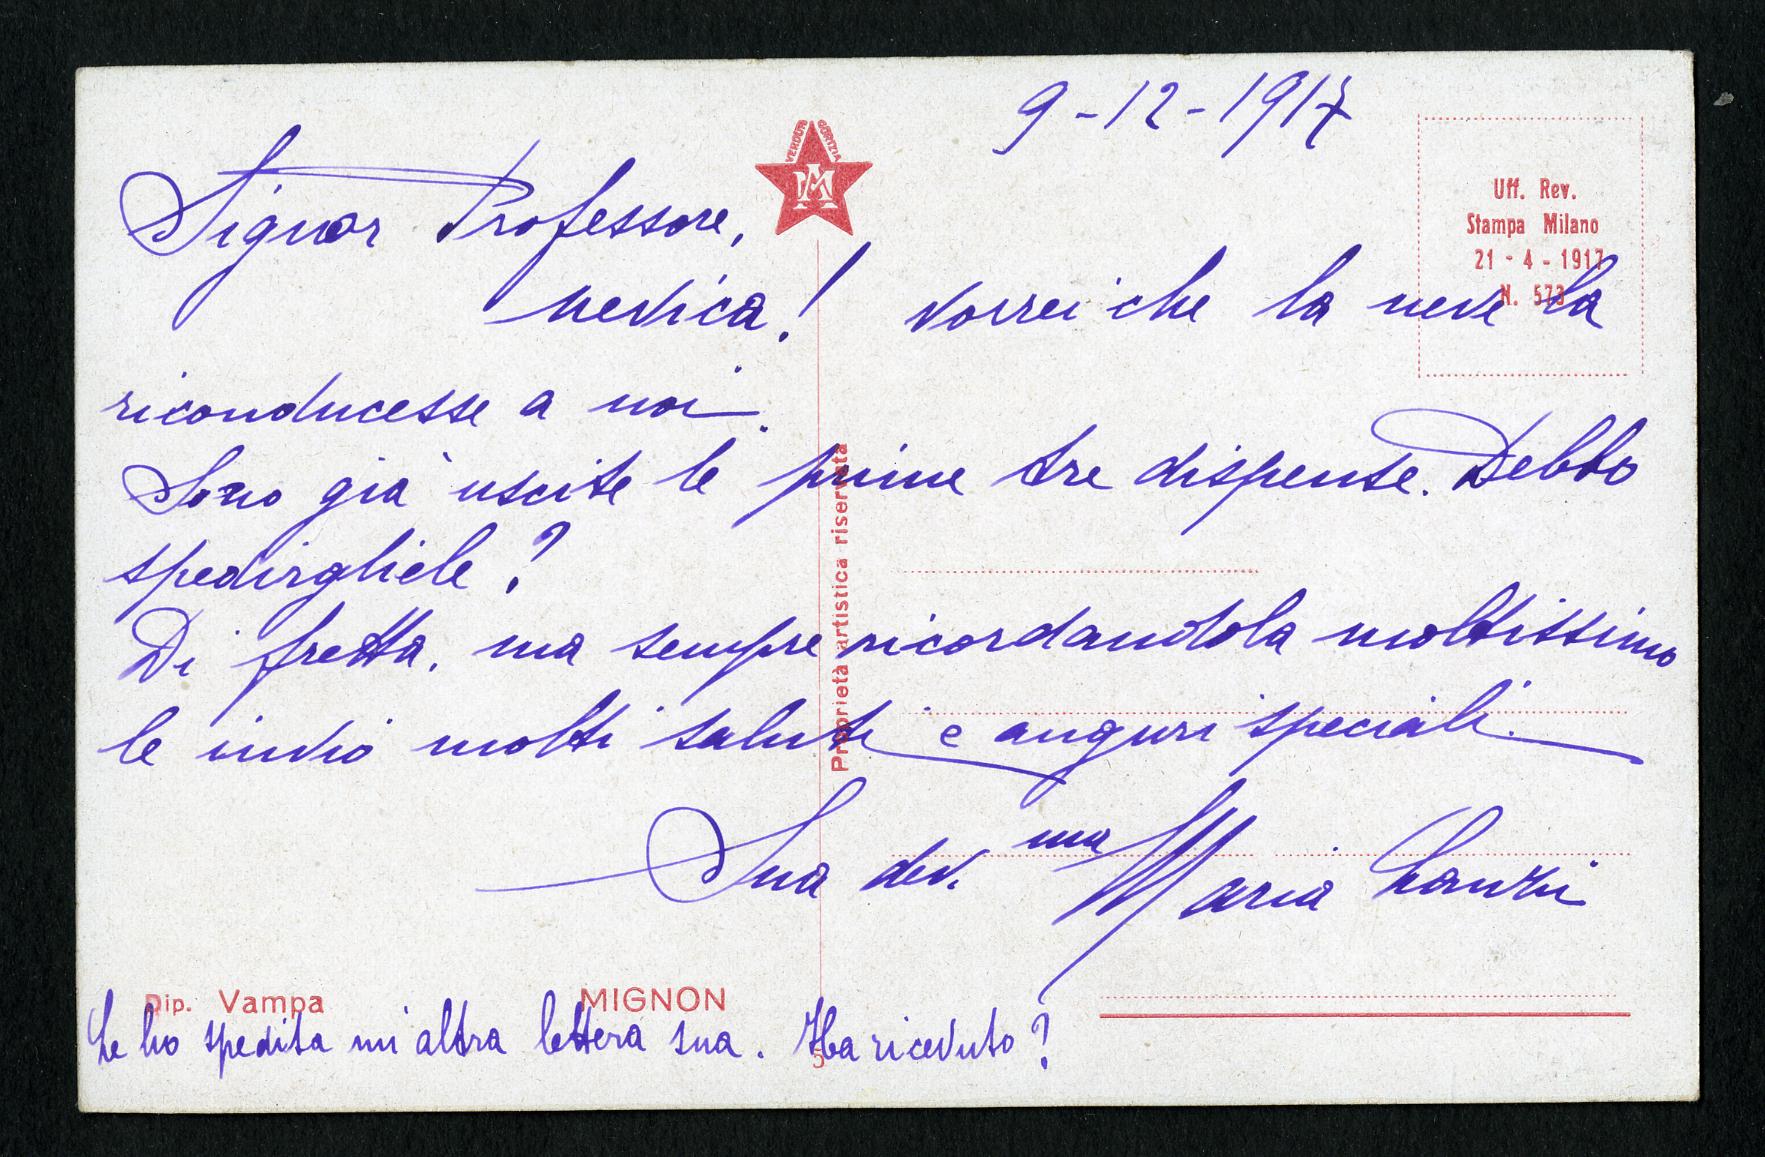 Lanzi Amelia Maria in Doniselli (I) | Aspi – Archivio